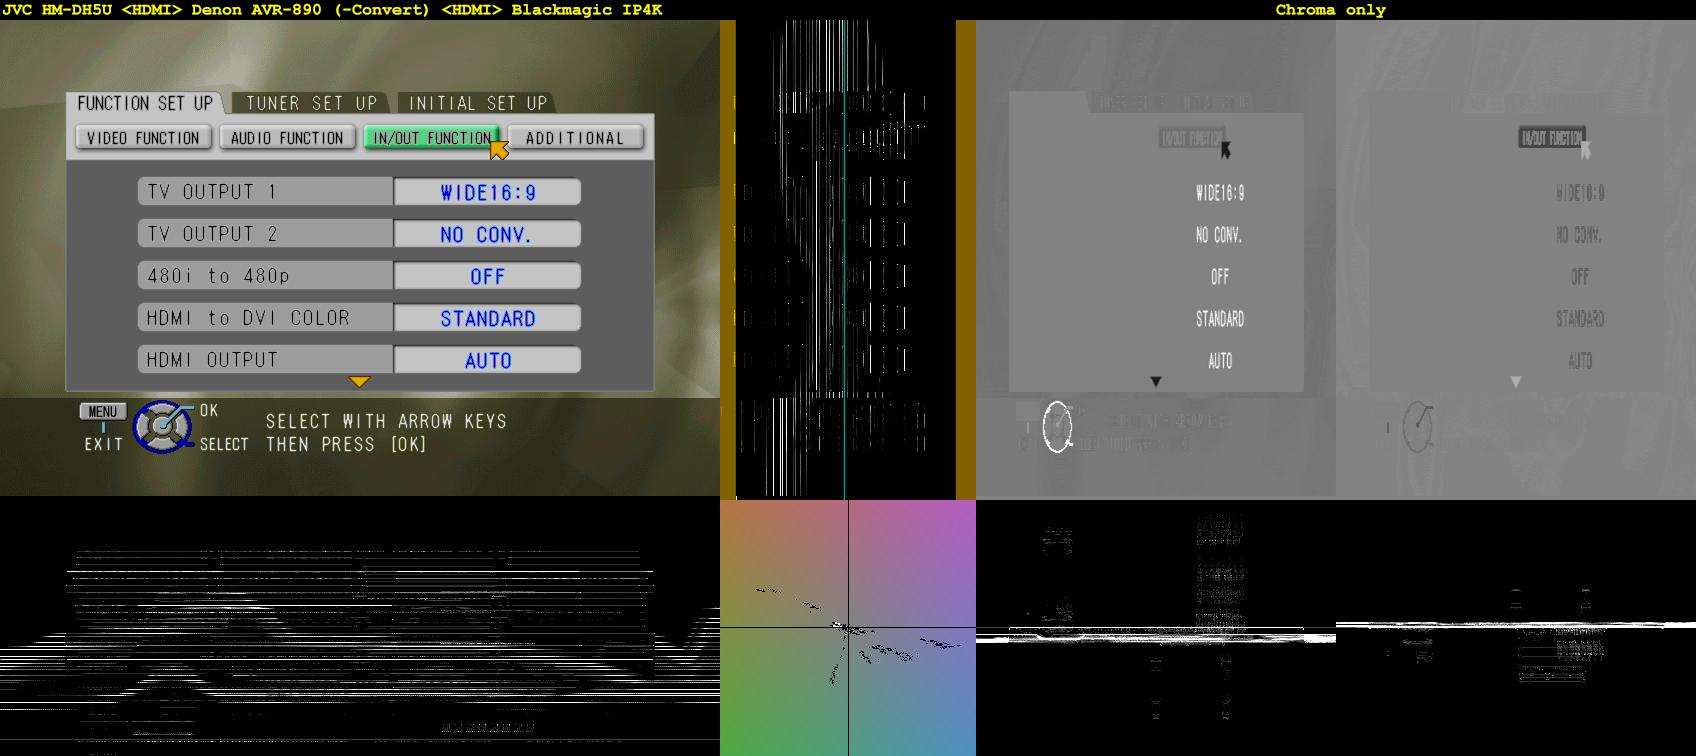 Click image for larger version  Name:Menu - JVC HM-DH5U =HDMI= Denon AVR-890, -Convert =HDMI= IP4K.png Views:3802 Size:396.0 KB ID:35274